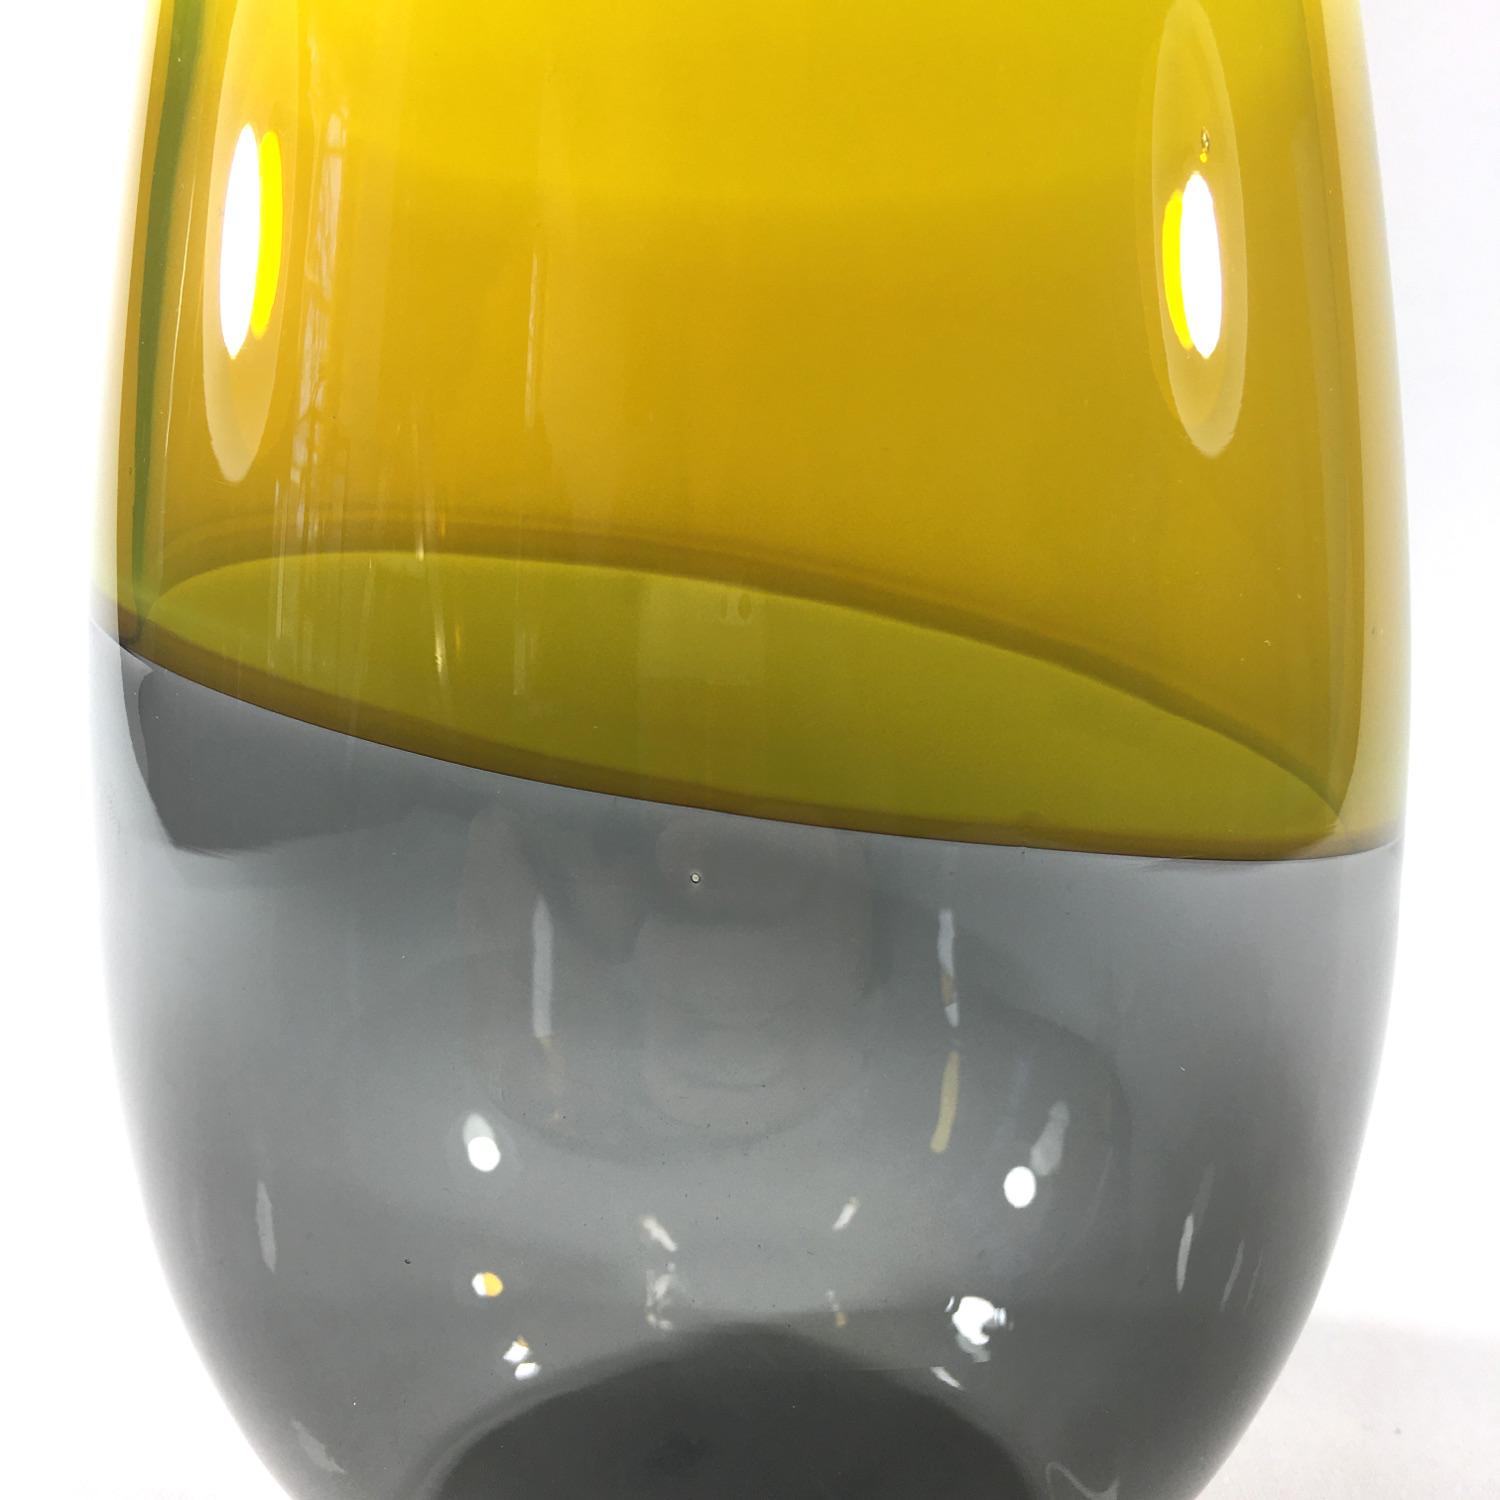 Incalmo Vase Knikk (grau/gelb) Bild 2